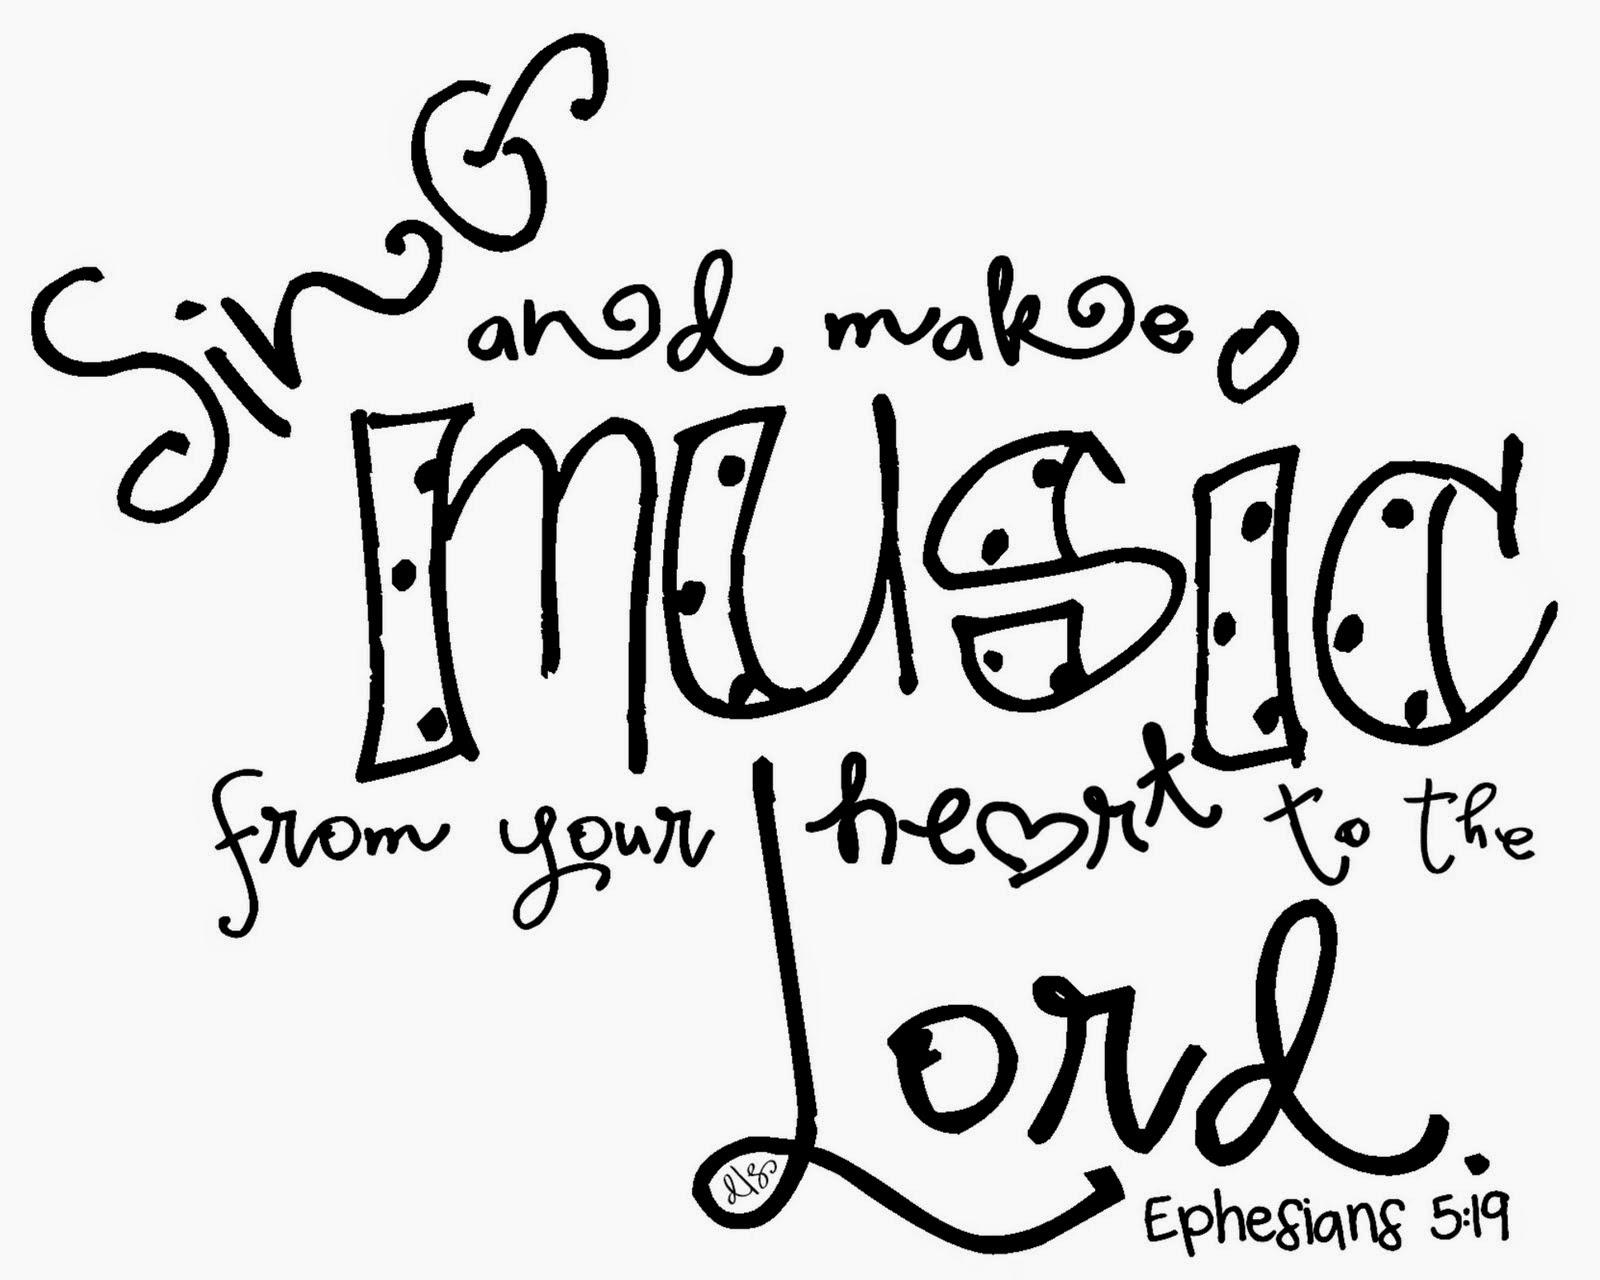 how to make harsh noise music